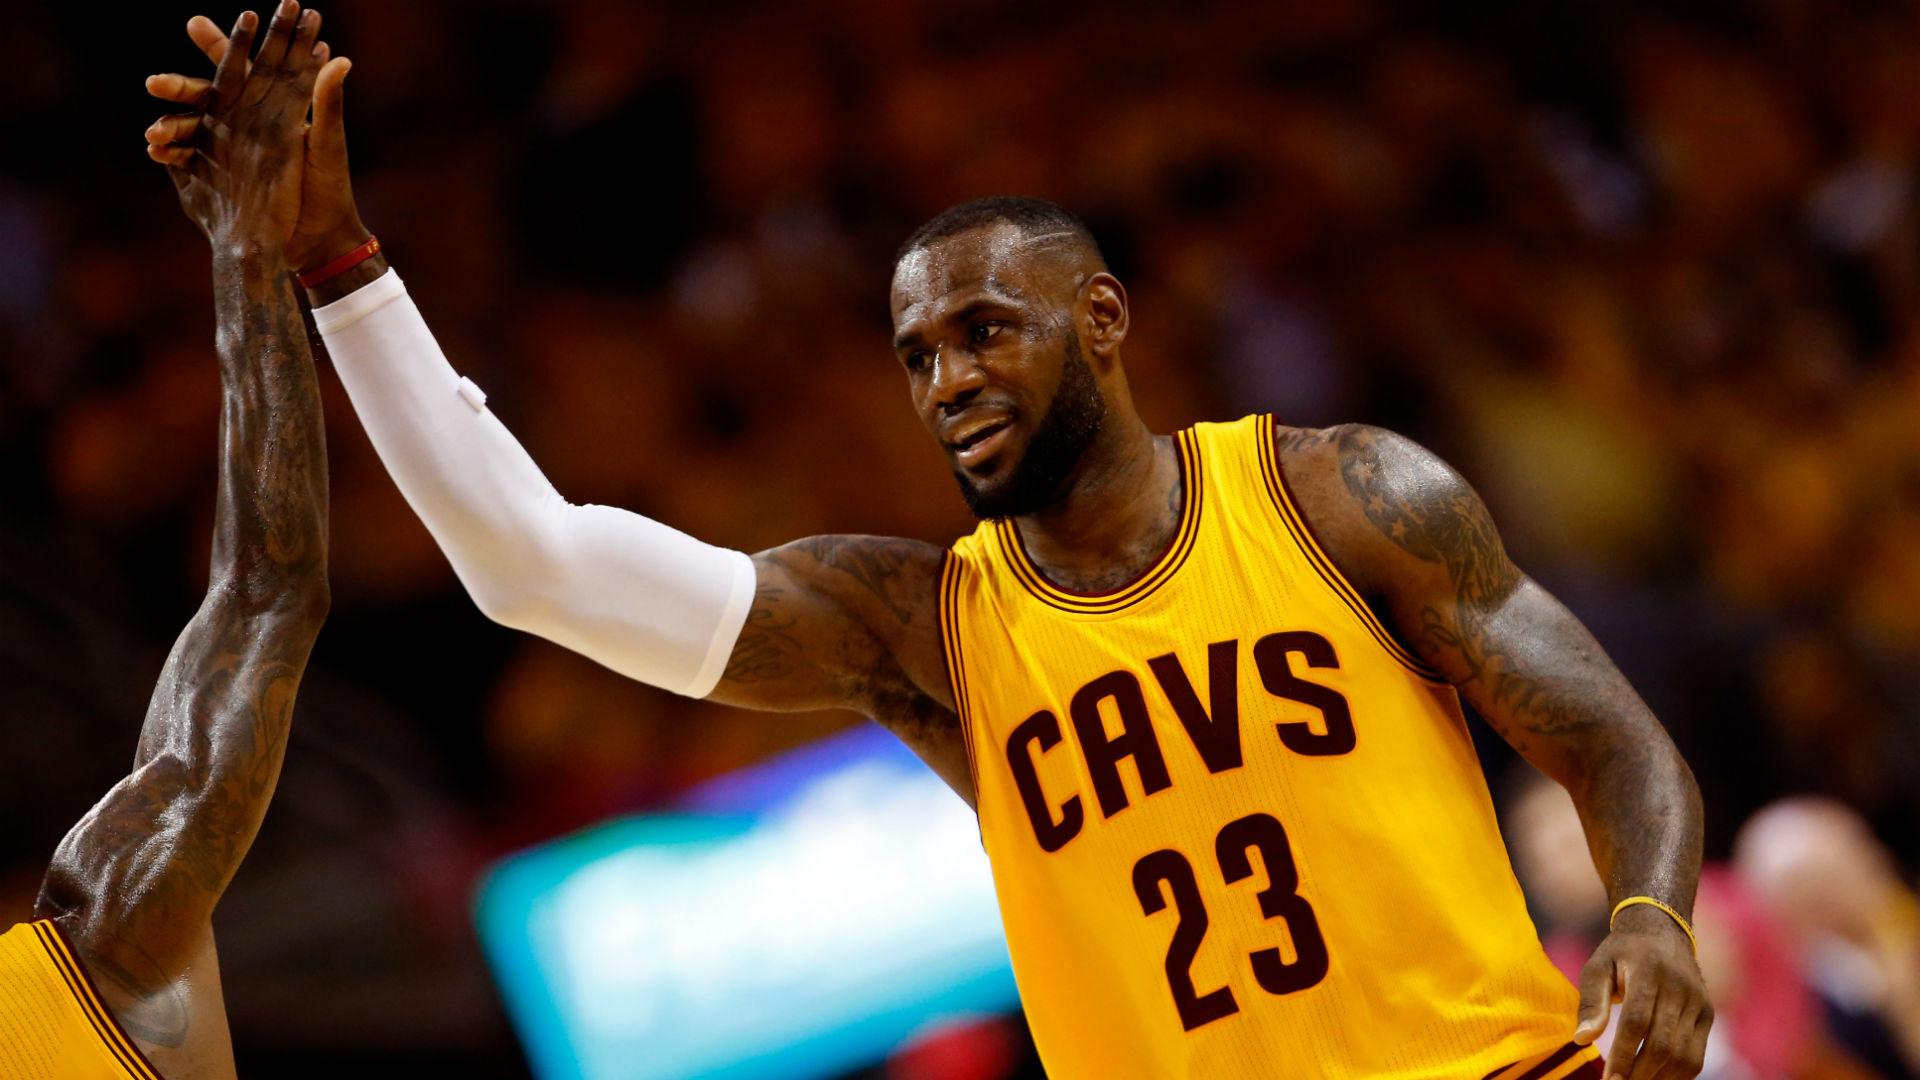 LeBron James nears accomplishing mission: A Cleveland championship